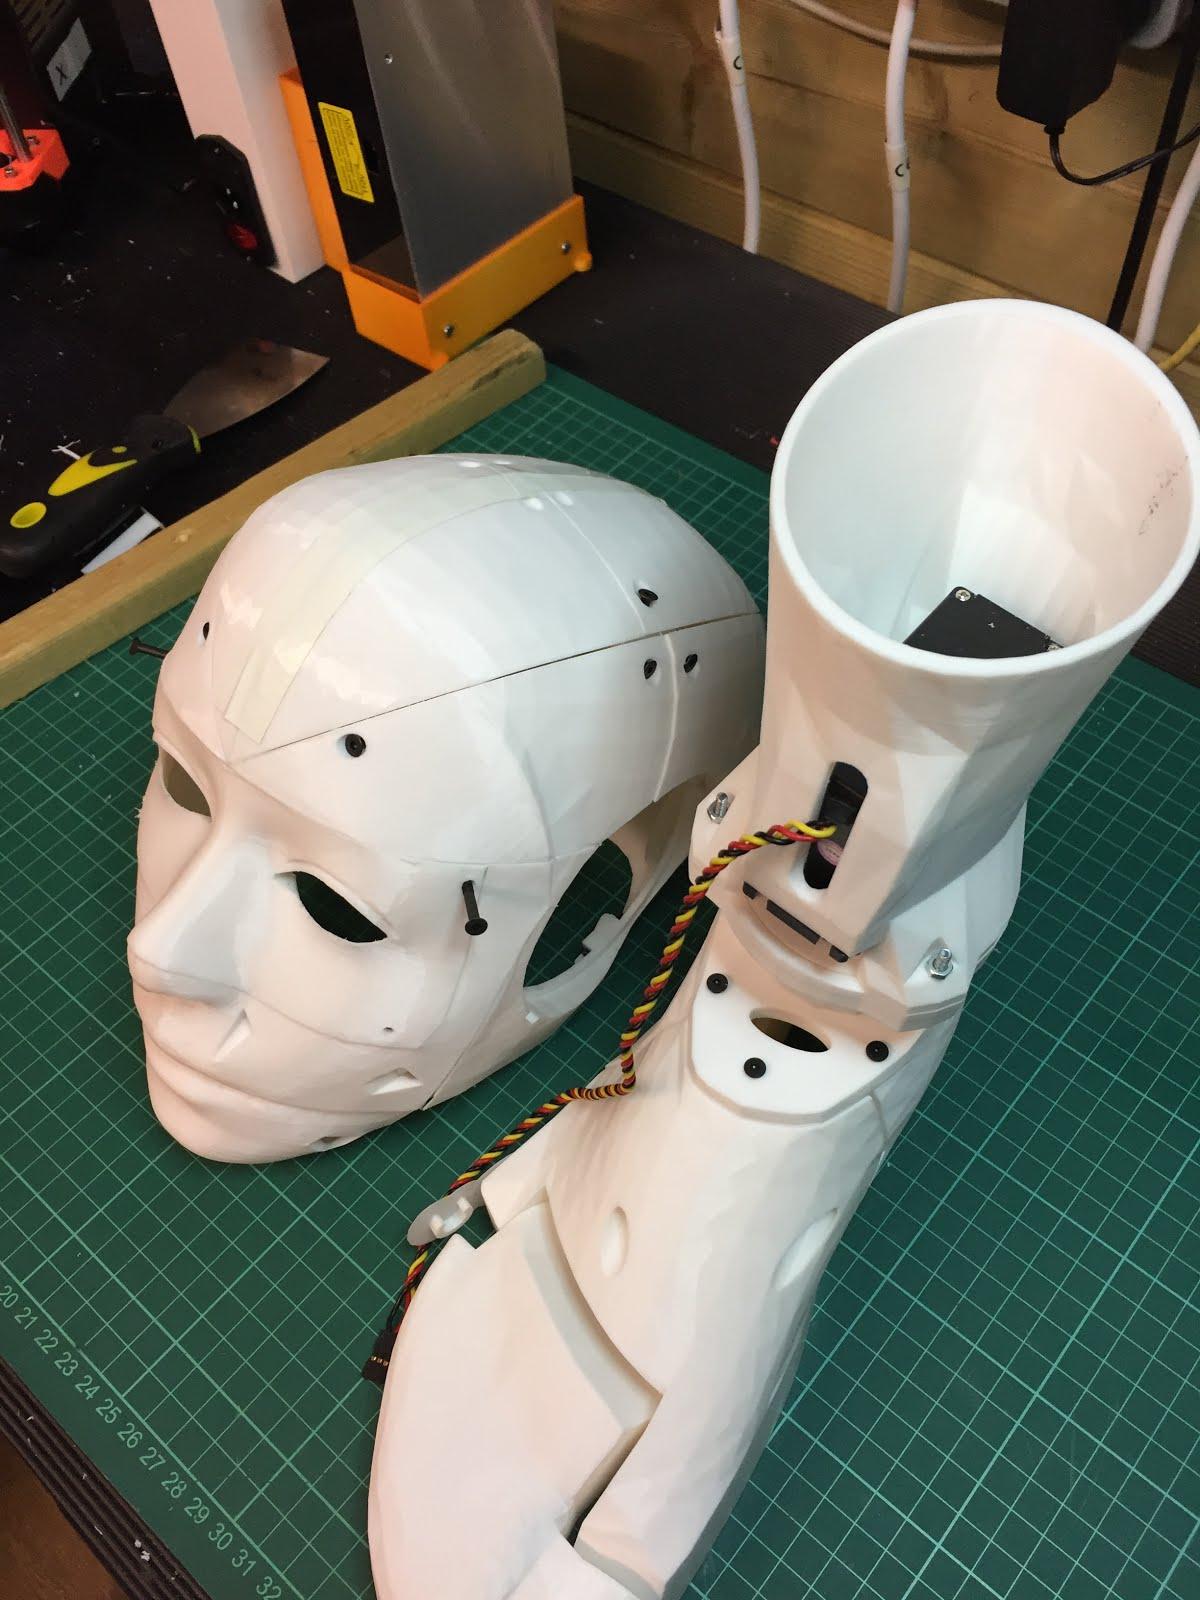 Bryan the Head Bot